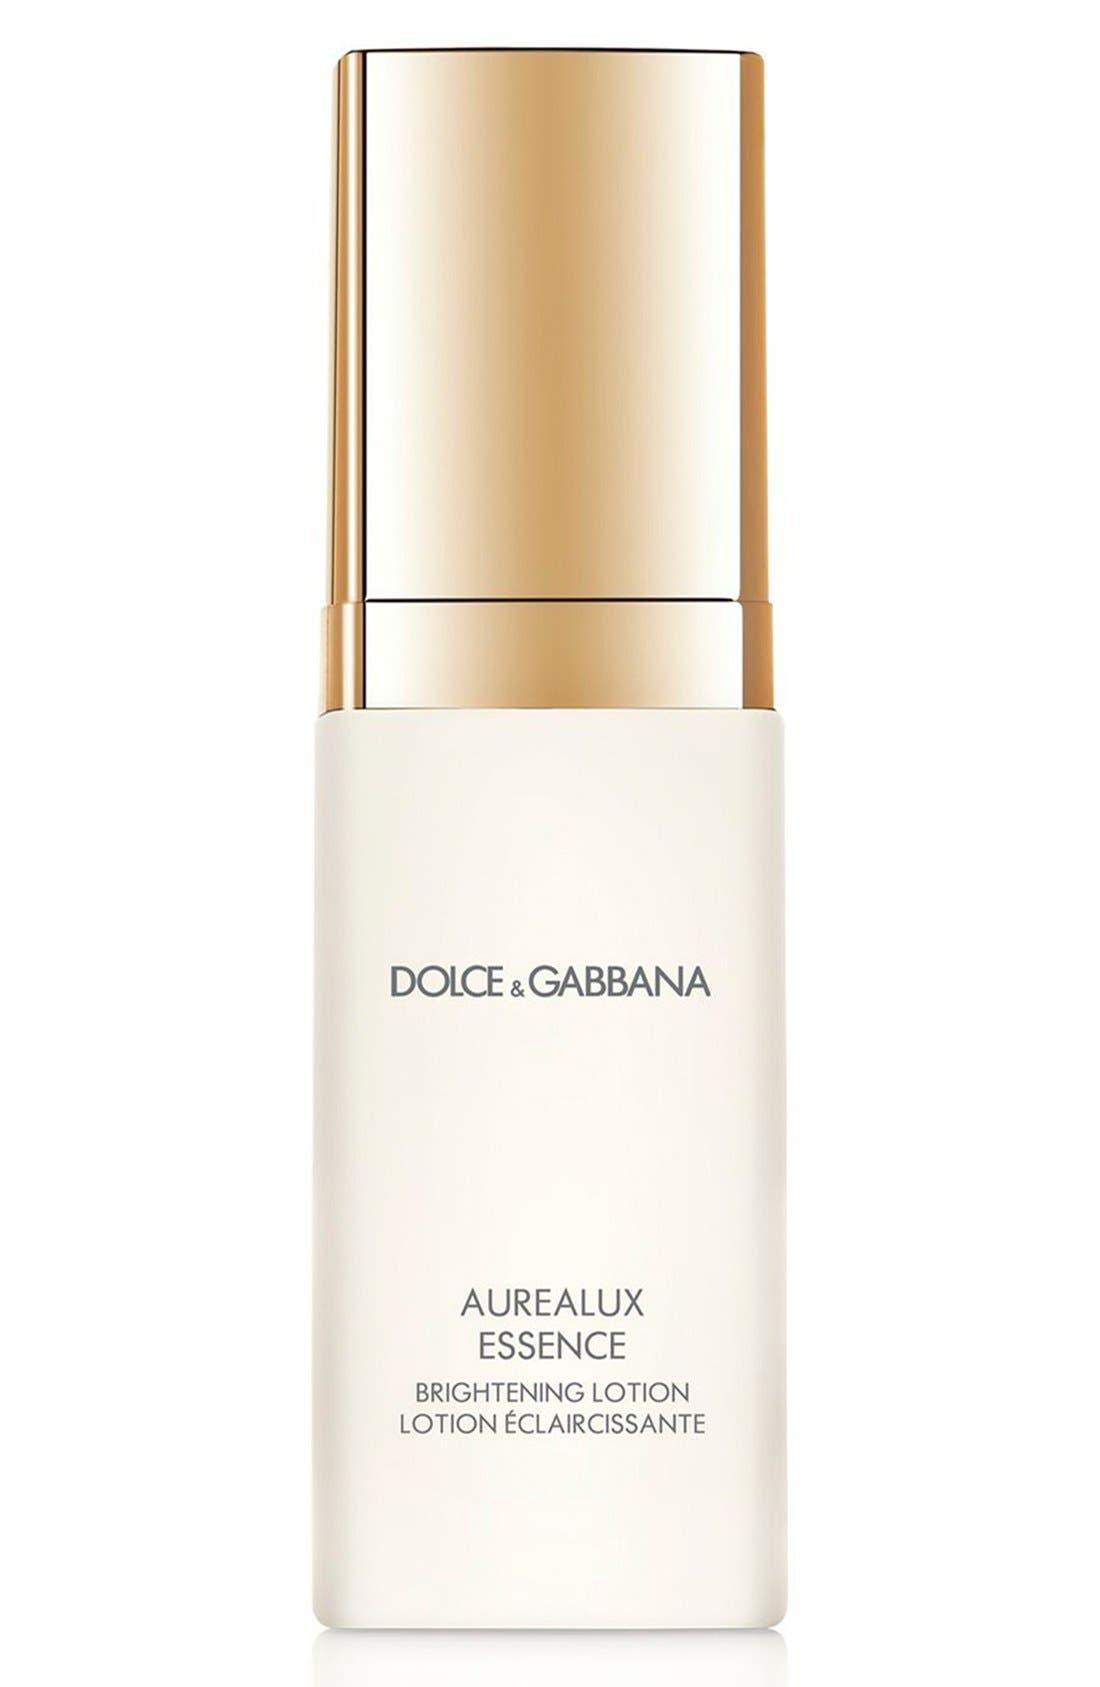 Dolce&GabbanaBeauty 'Aurealux' Essence Brightening Lotion,                             Main thumbnail 1, color,                             000